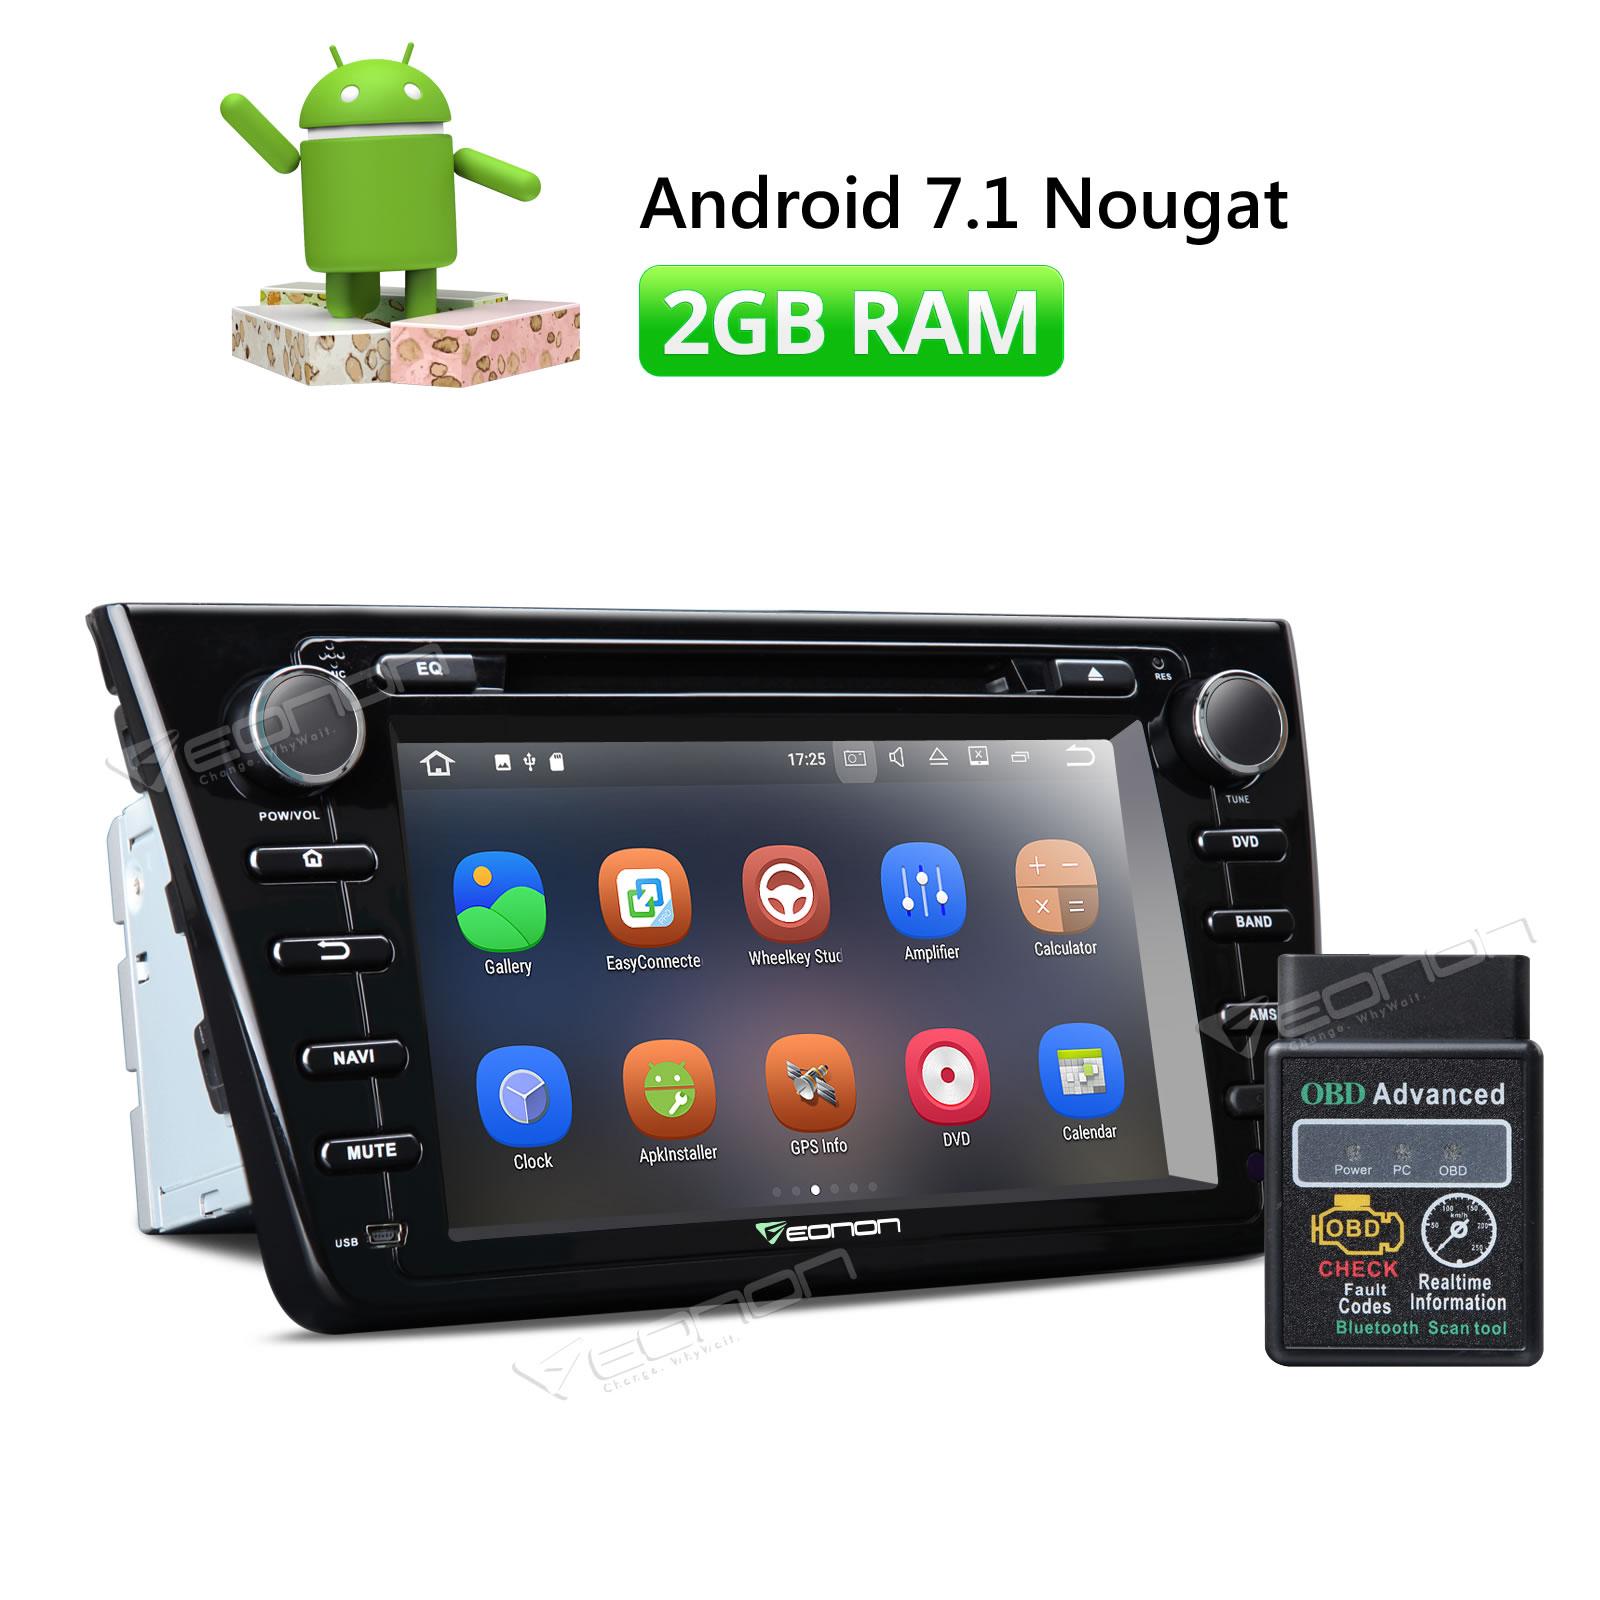 OBDII и Eonon 8 HD Android 7,1 Штатная стерео gps SAT Nav Системы радио для Mazda 6 2009 2010 2011 2012 WiFi DAB +